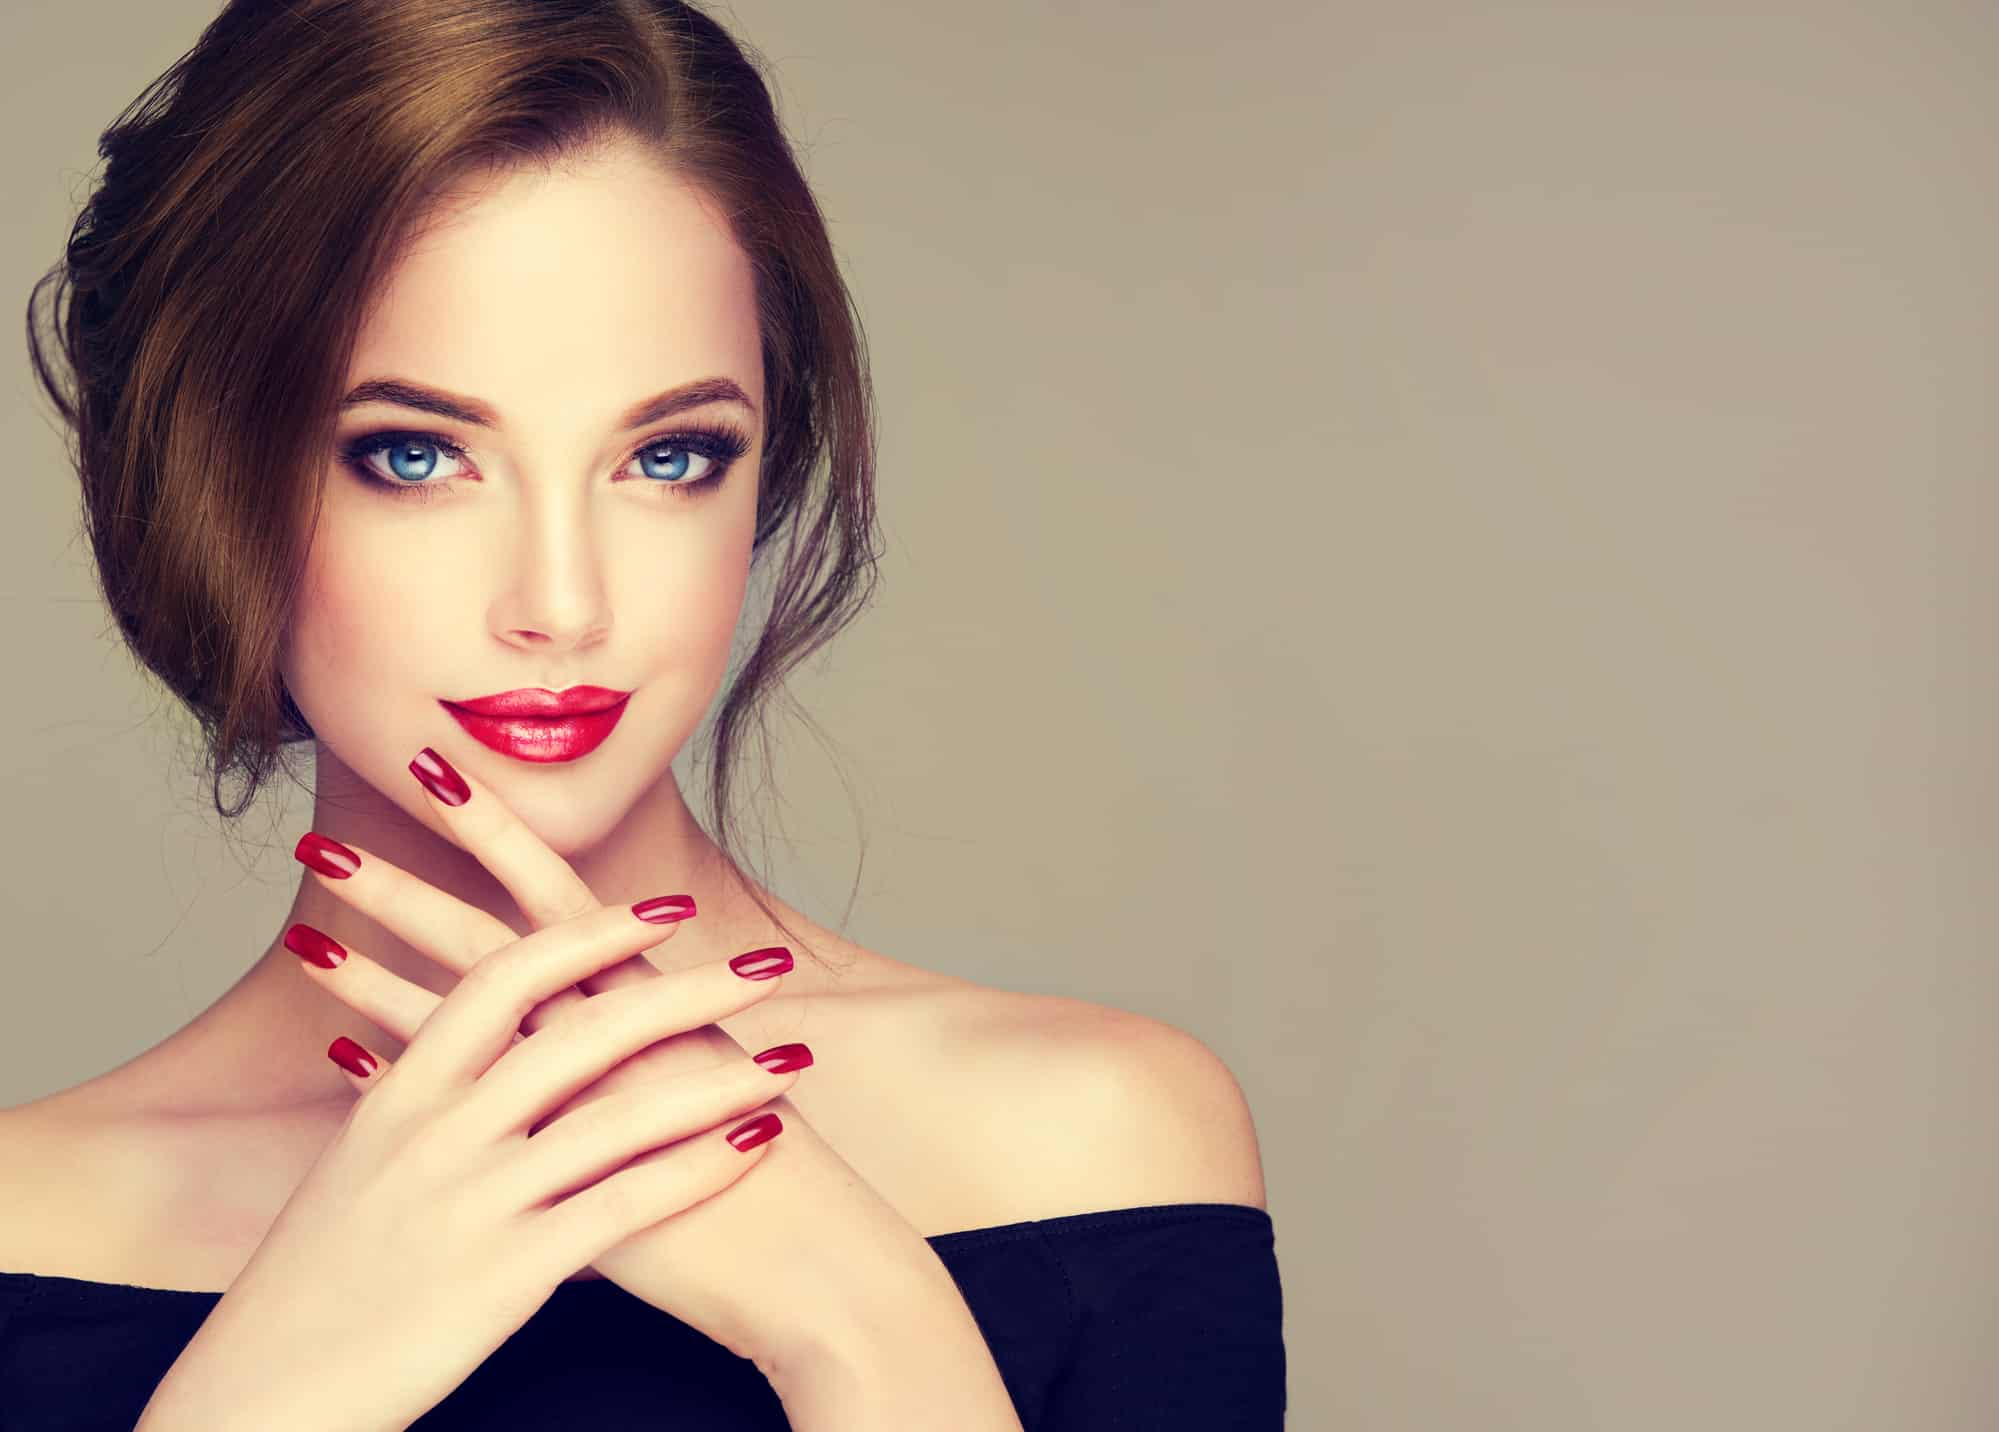 beautiful redhead wearing red 5 free non-toxic nail polish